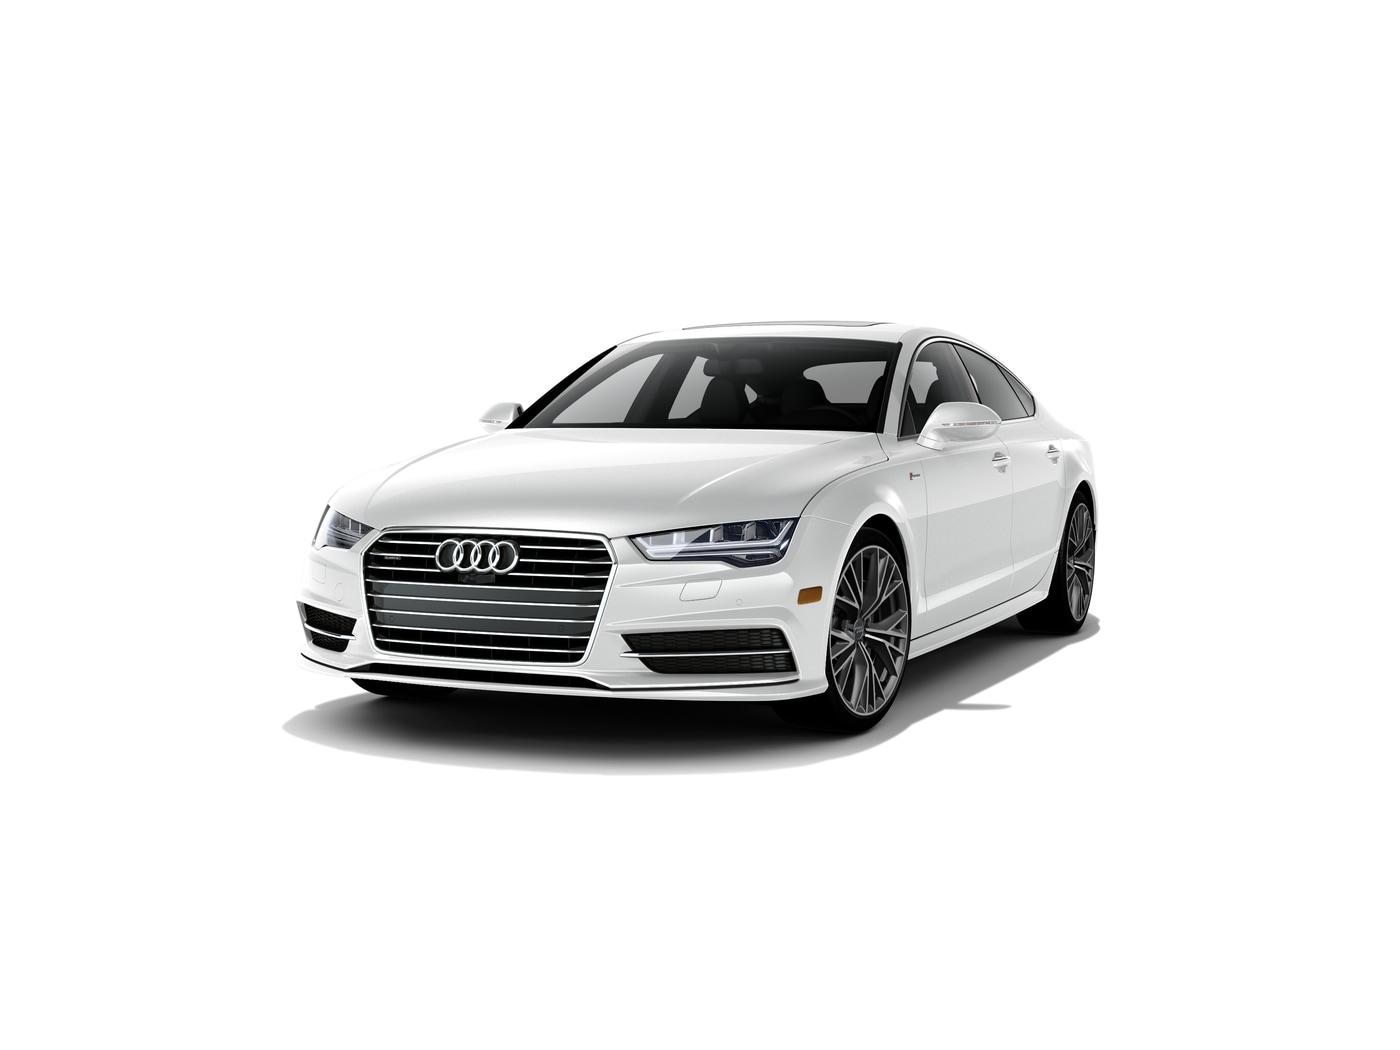 2018 Audi A7 Hatchback